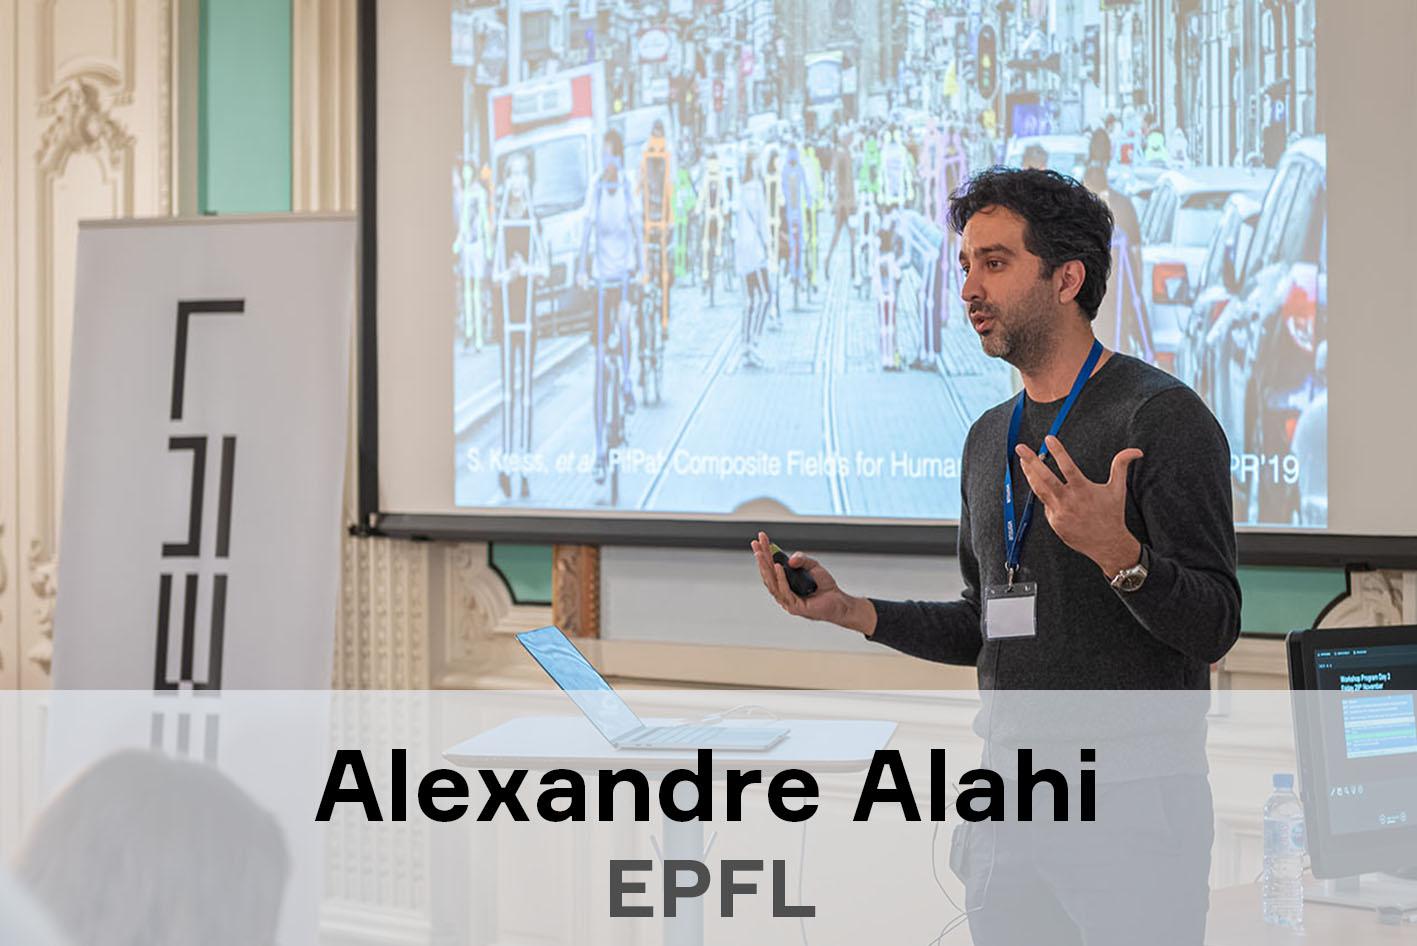 Alexandre Alahi